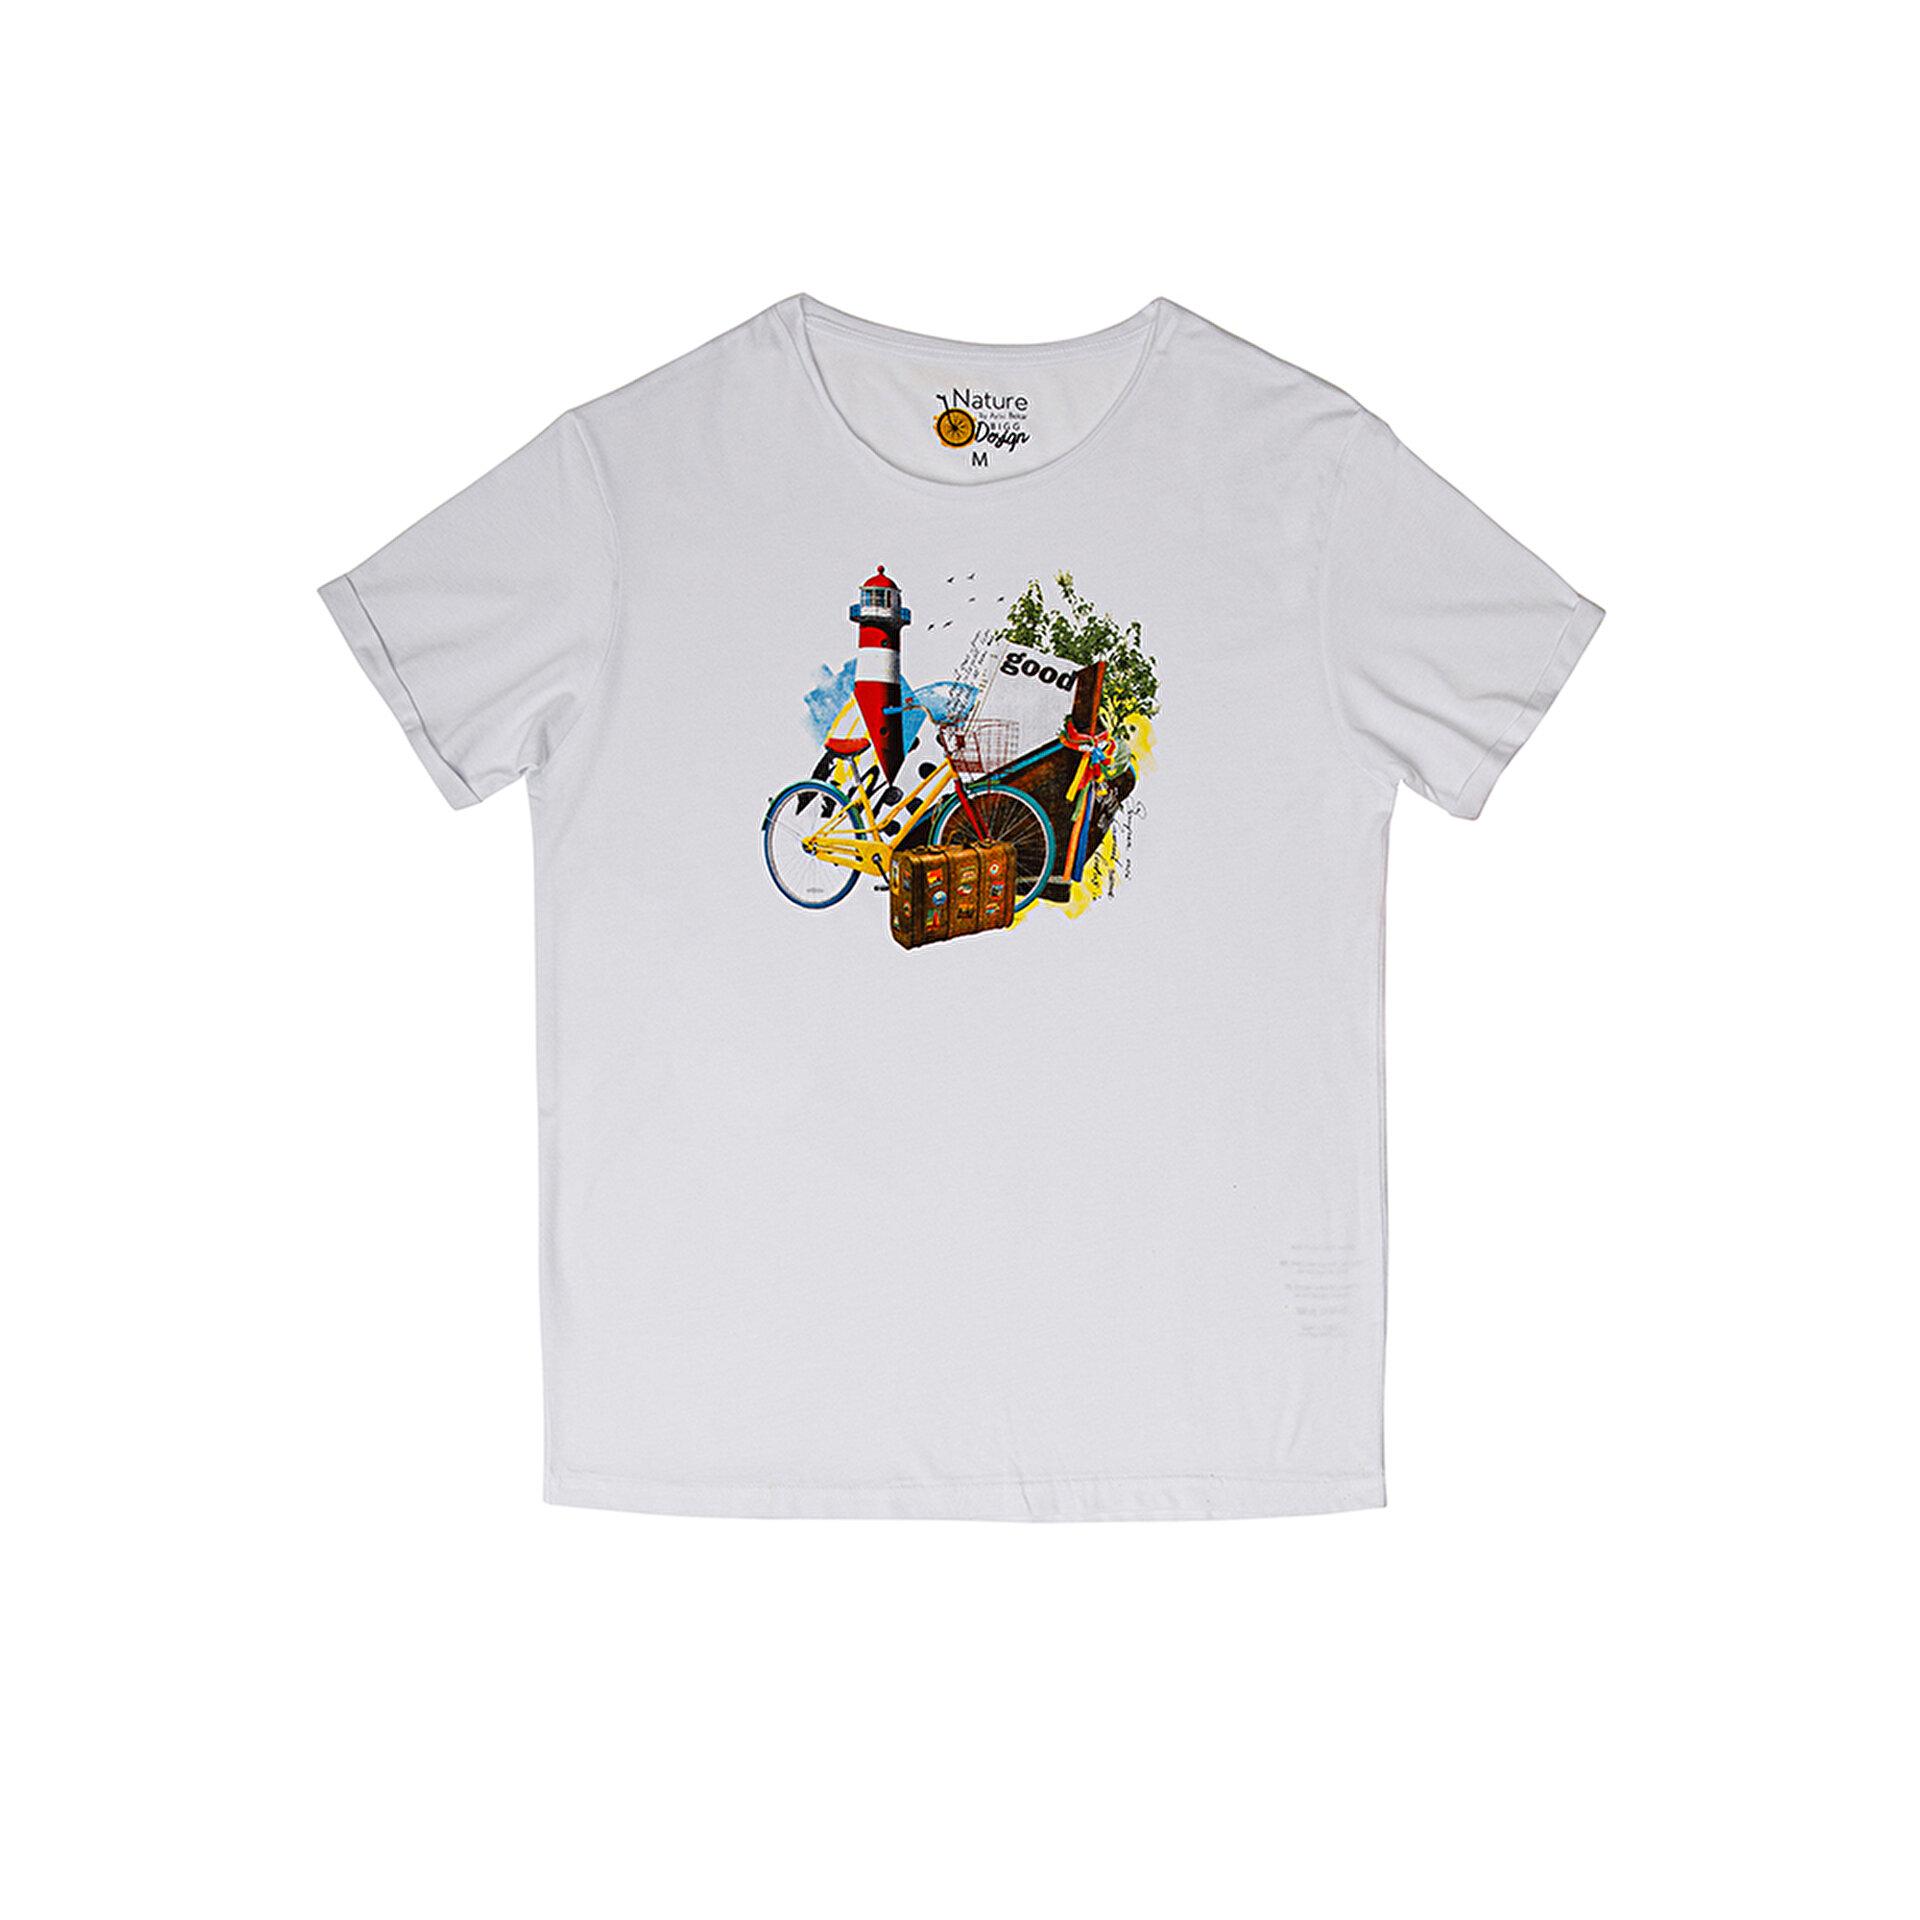 Picture of BiggDesign Nature Gezgin Erkek T-shirt